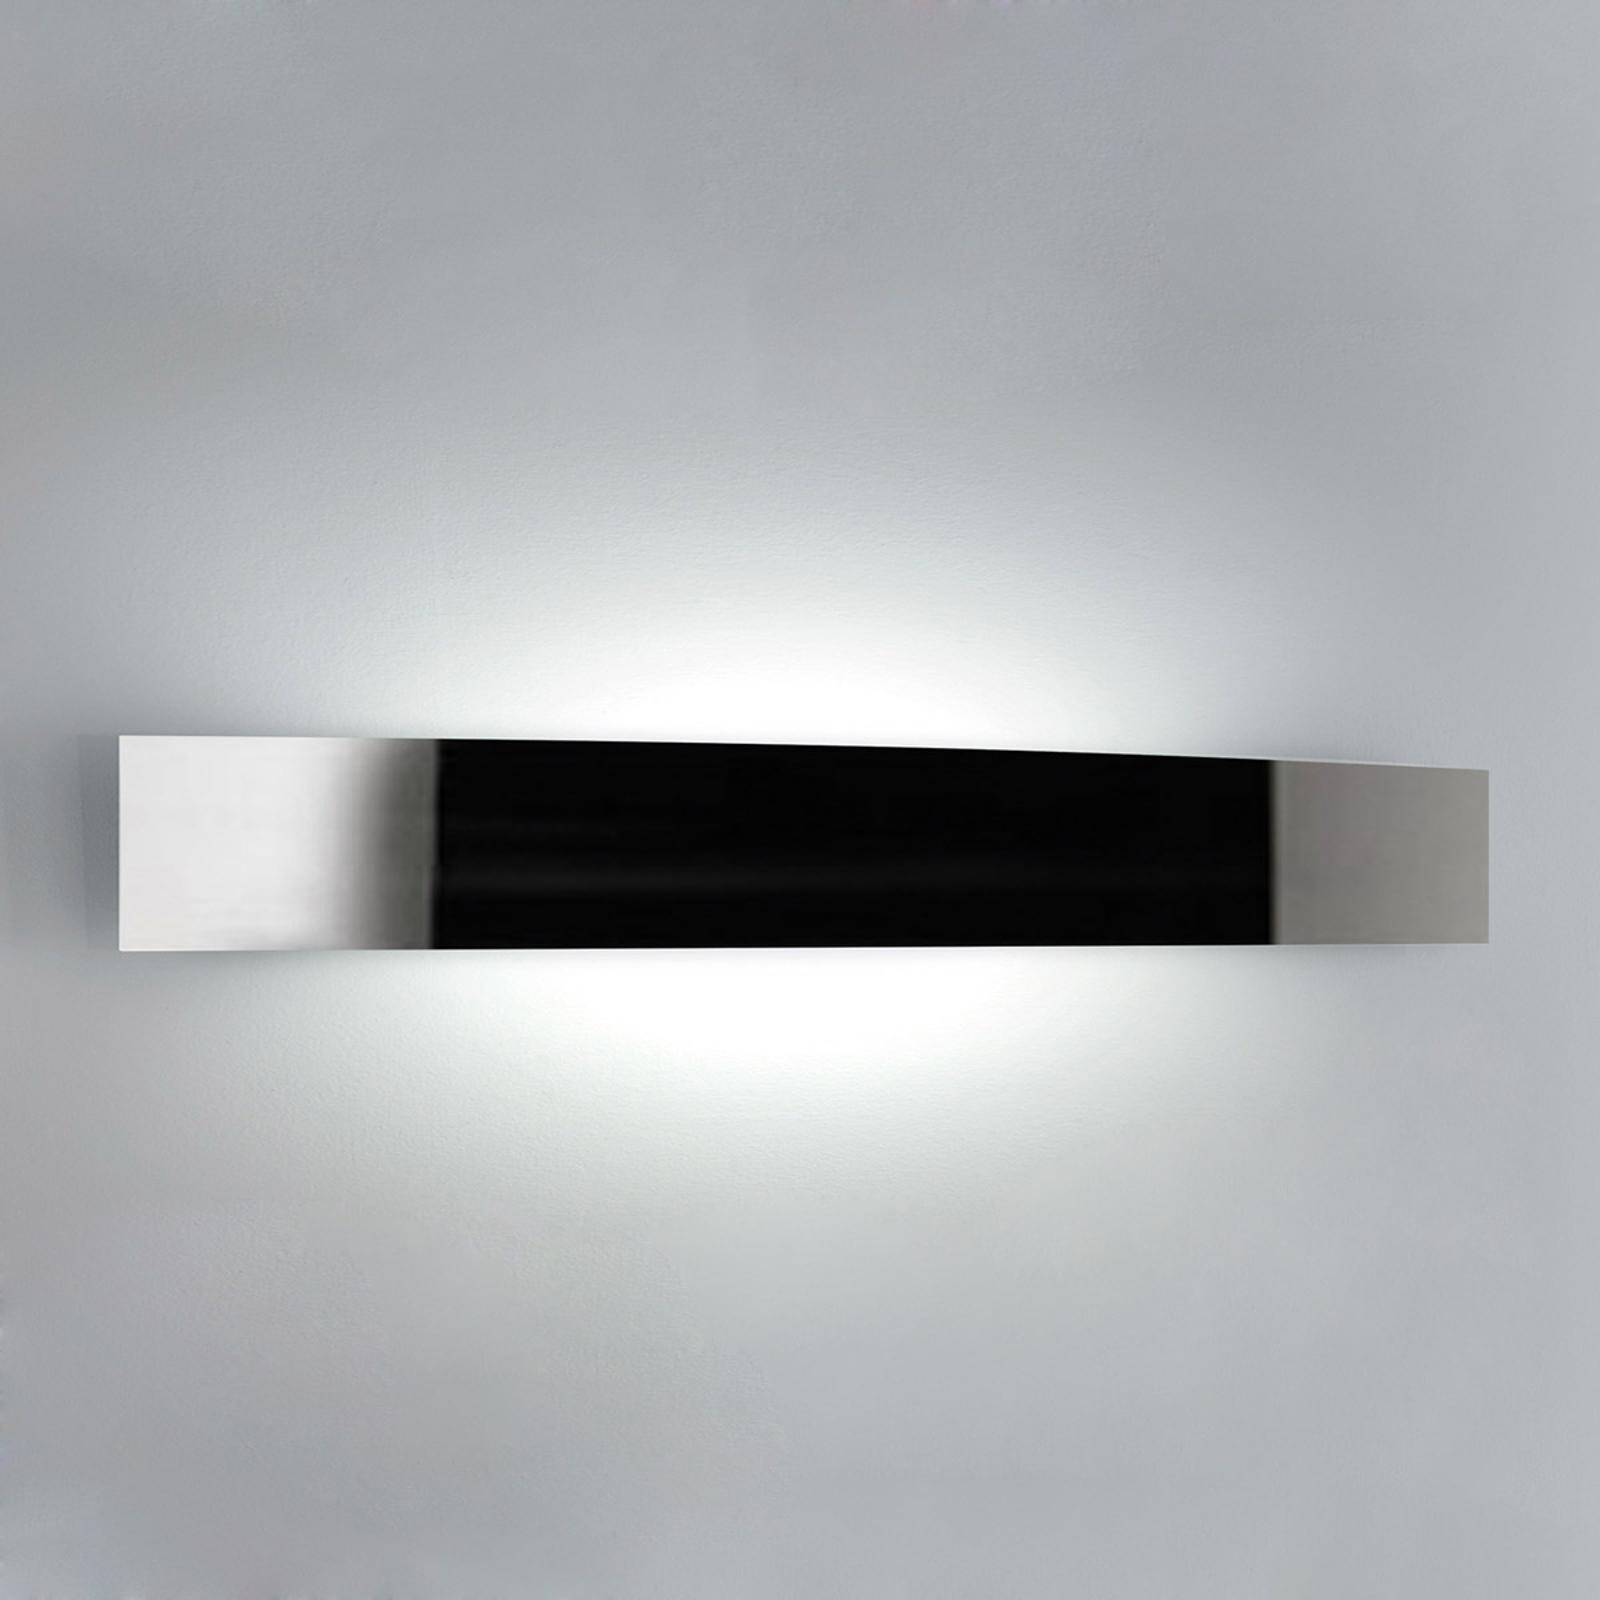 Lampa ścienna RIGA szerokość 56 cm stal szlachetna